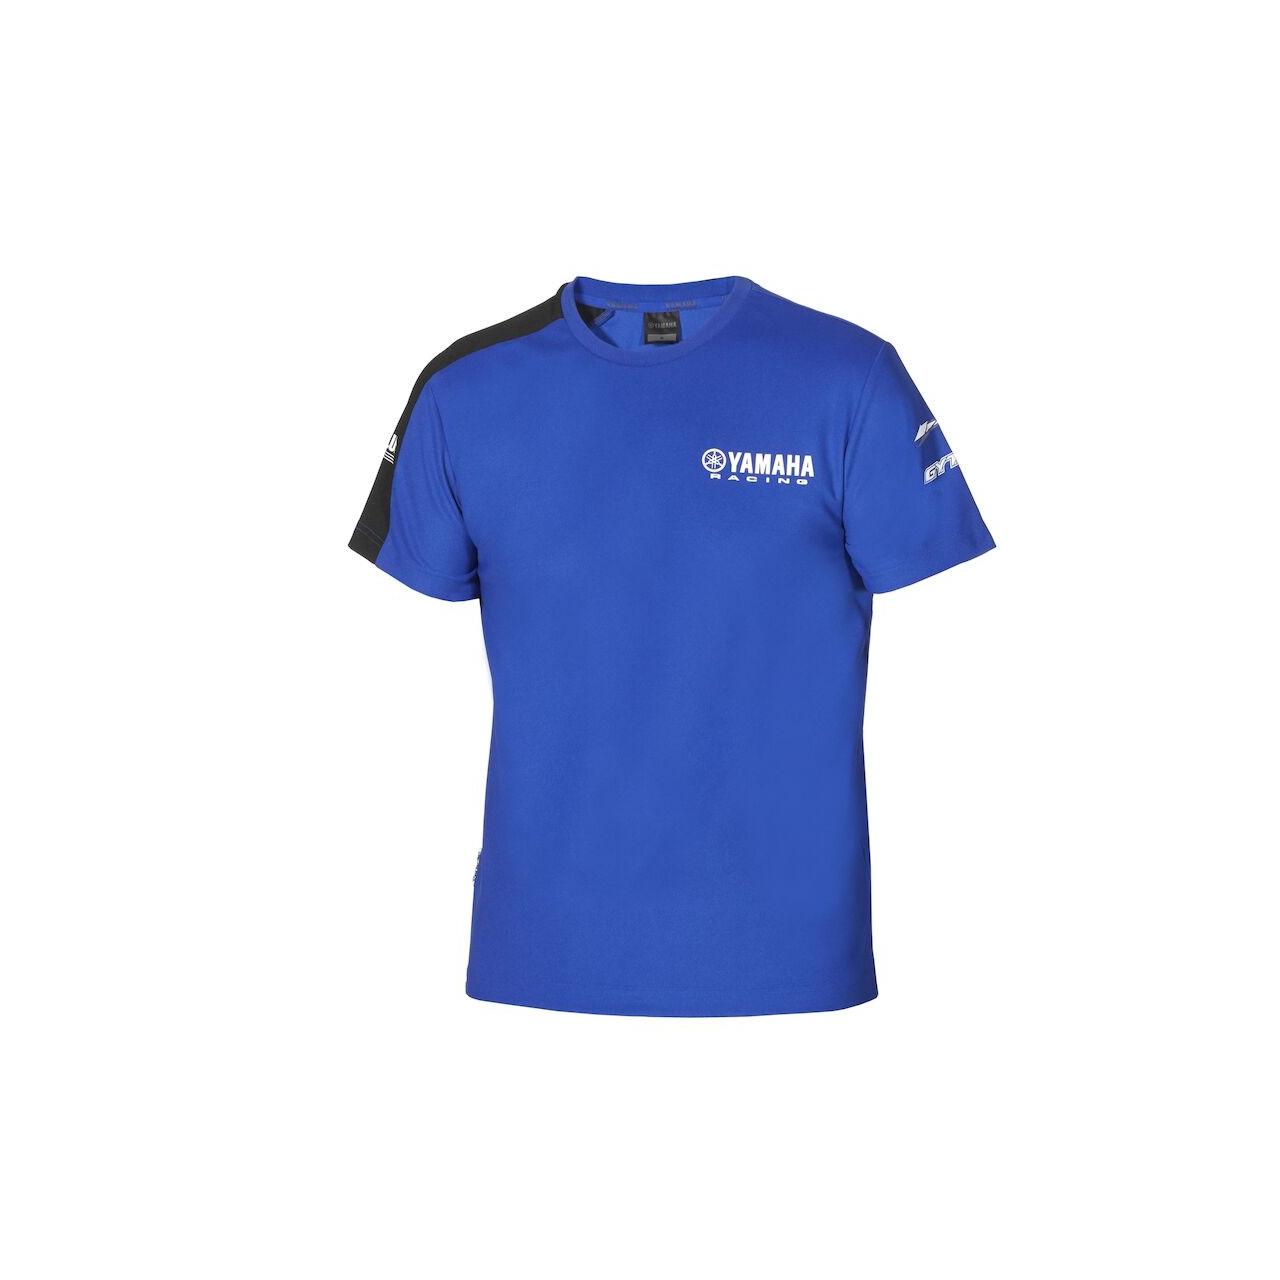 YAMAHA T-shirt homme Lambeth Paddock 2020